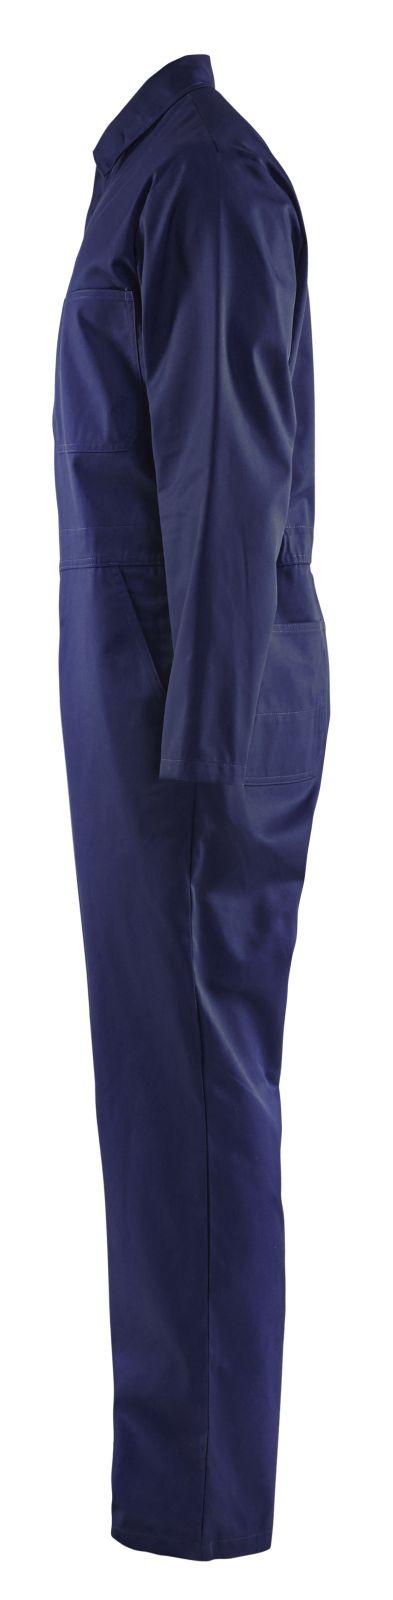 Blaklader Overalls 62701800 marineblauw(8900)